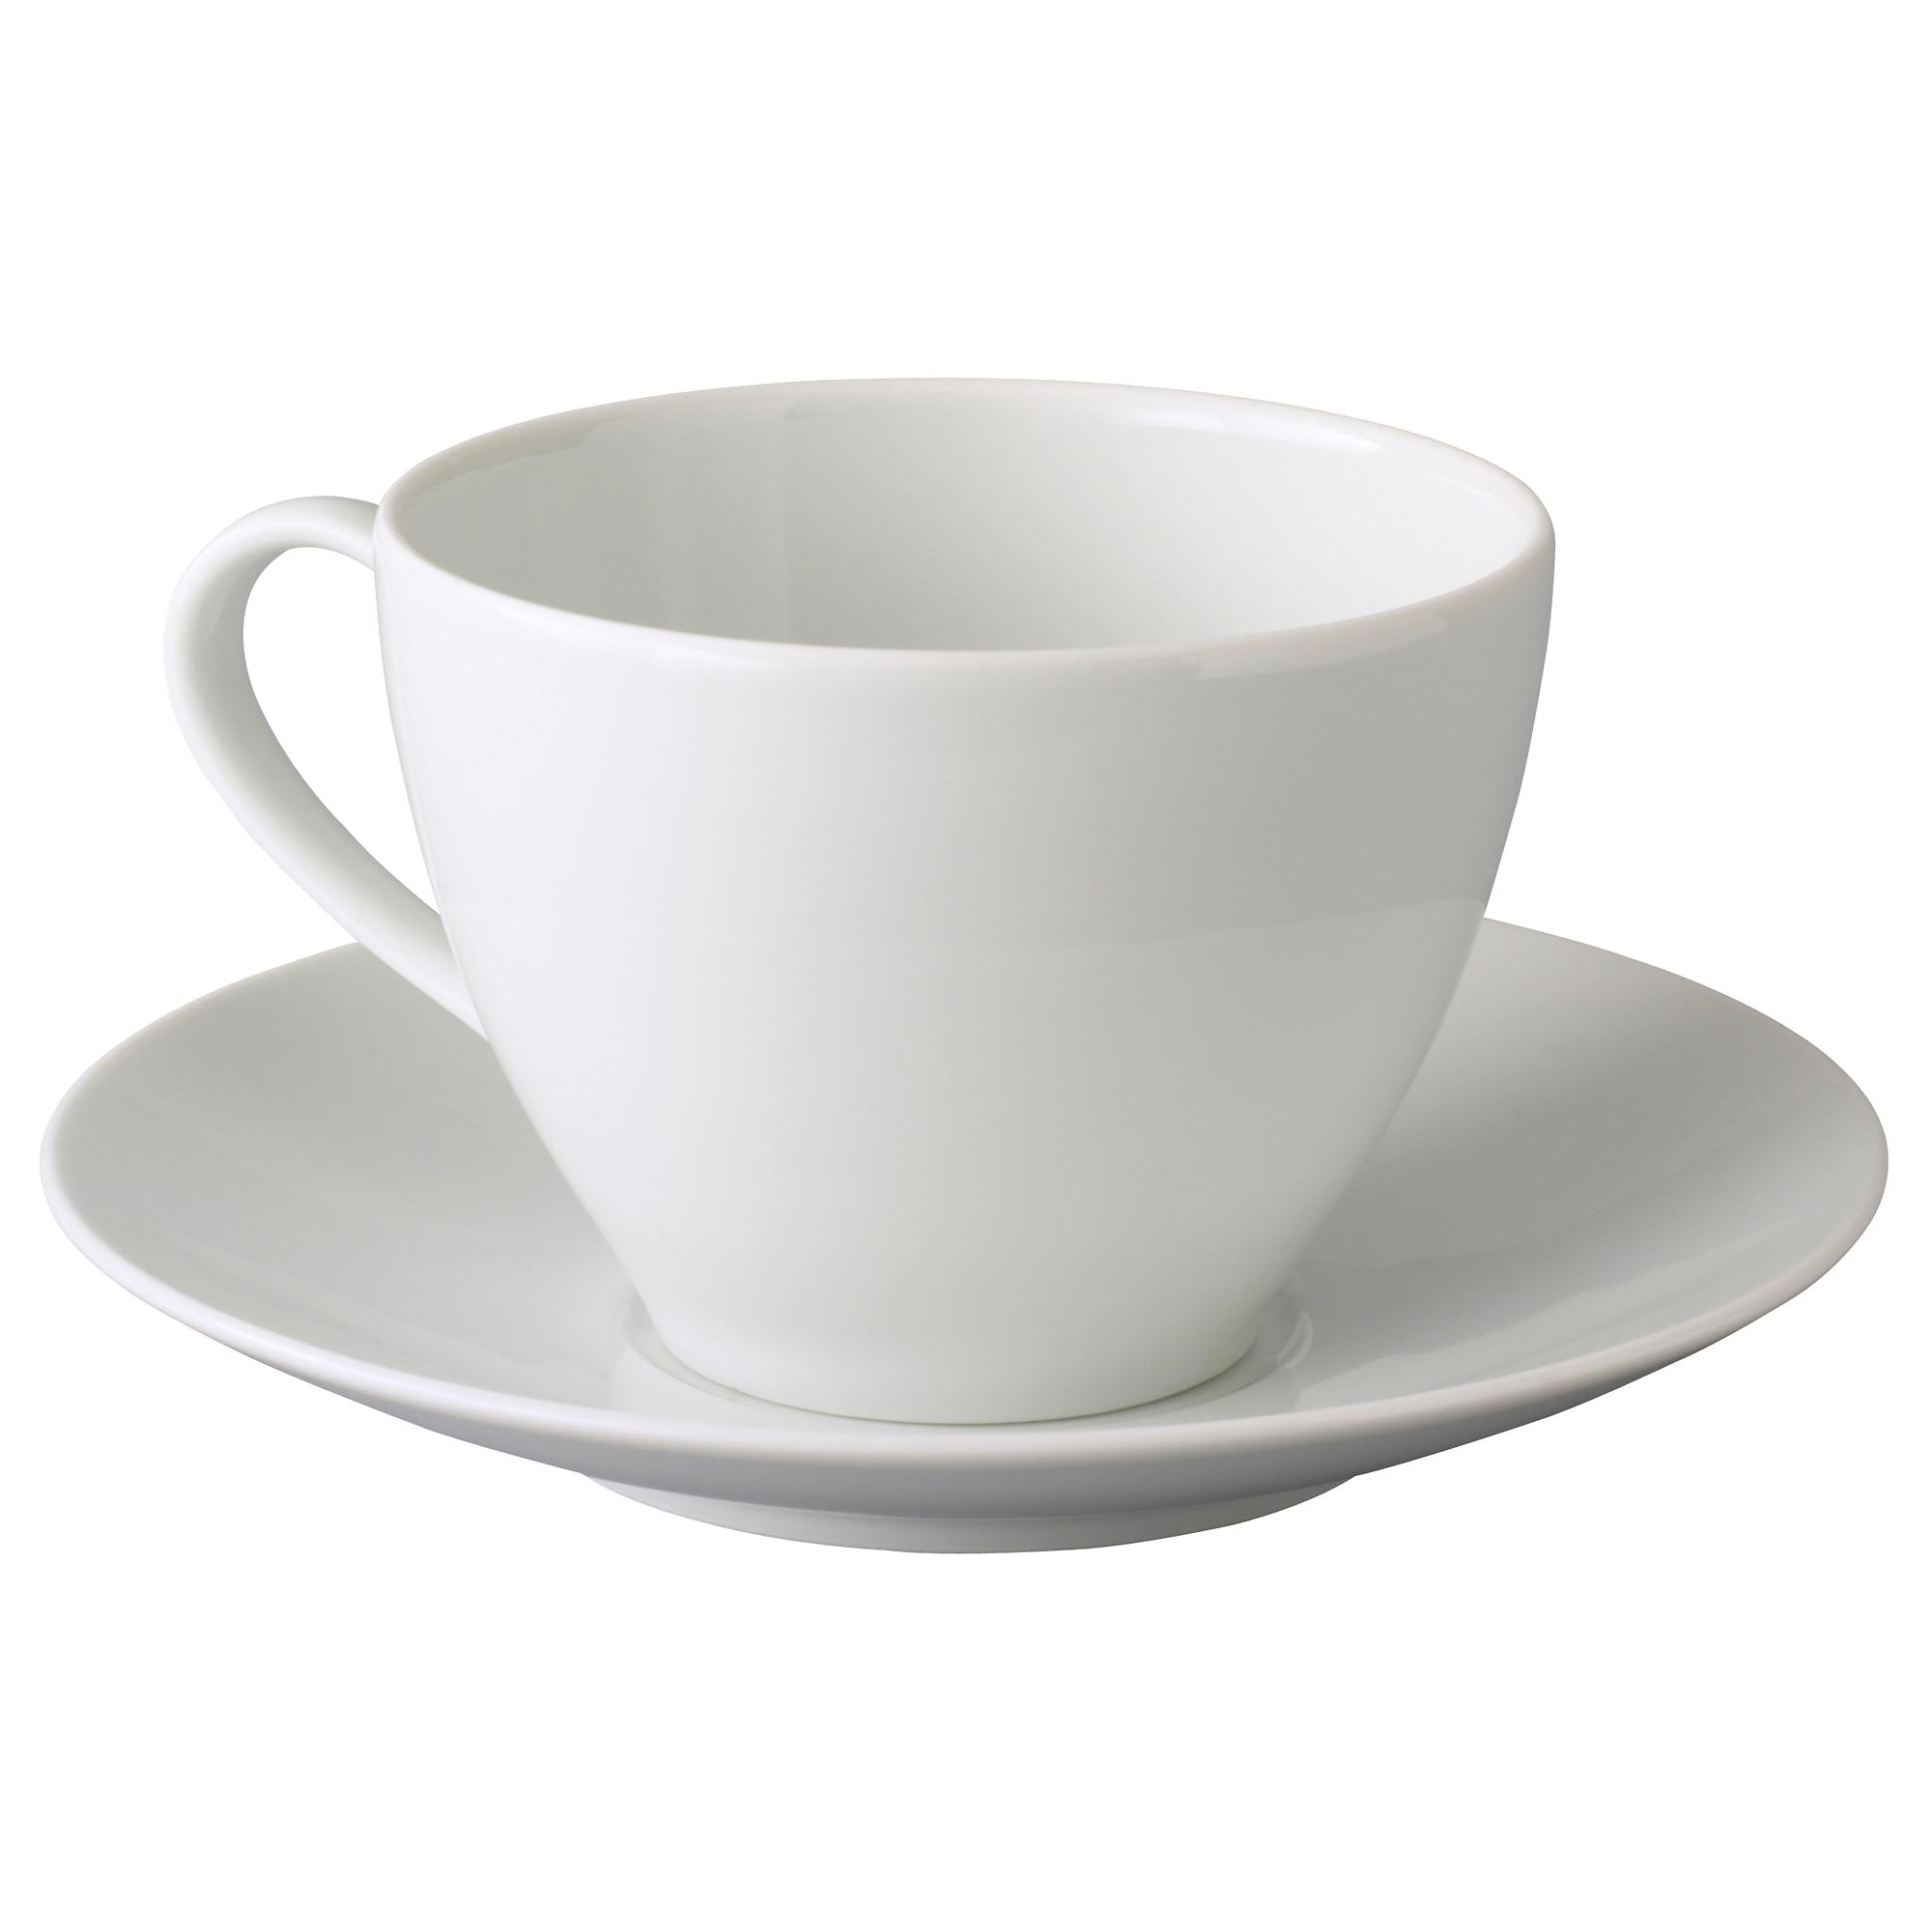 Tea Cup PNG File - PNG Cup Of Tea